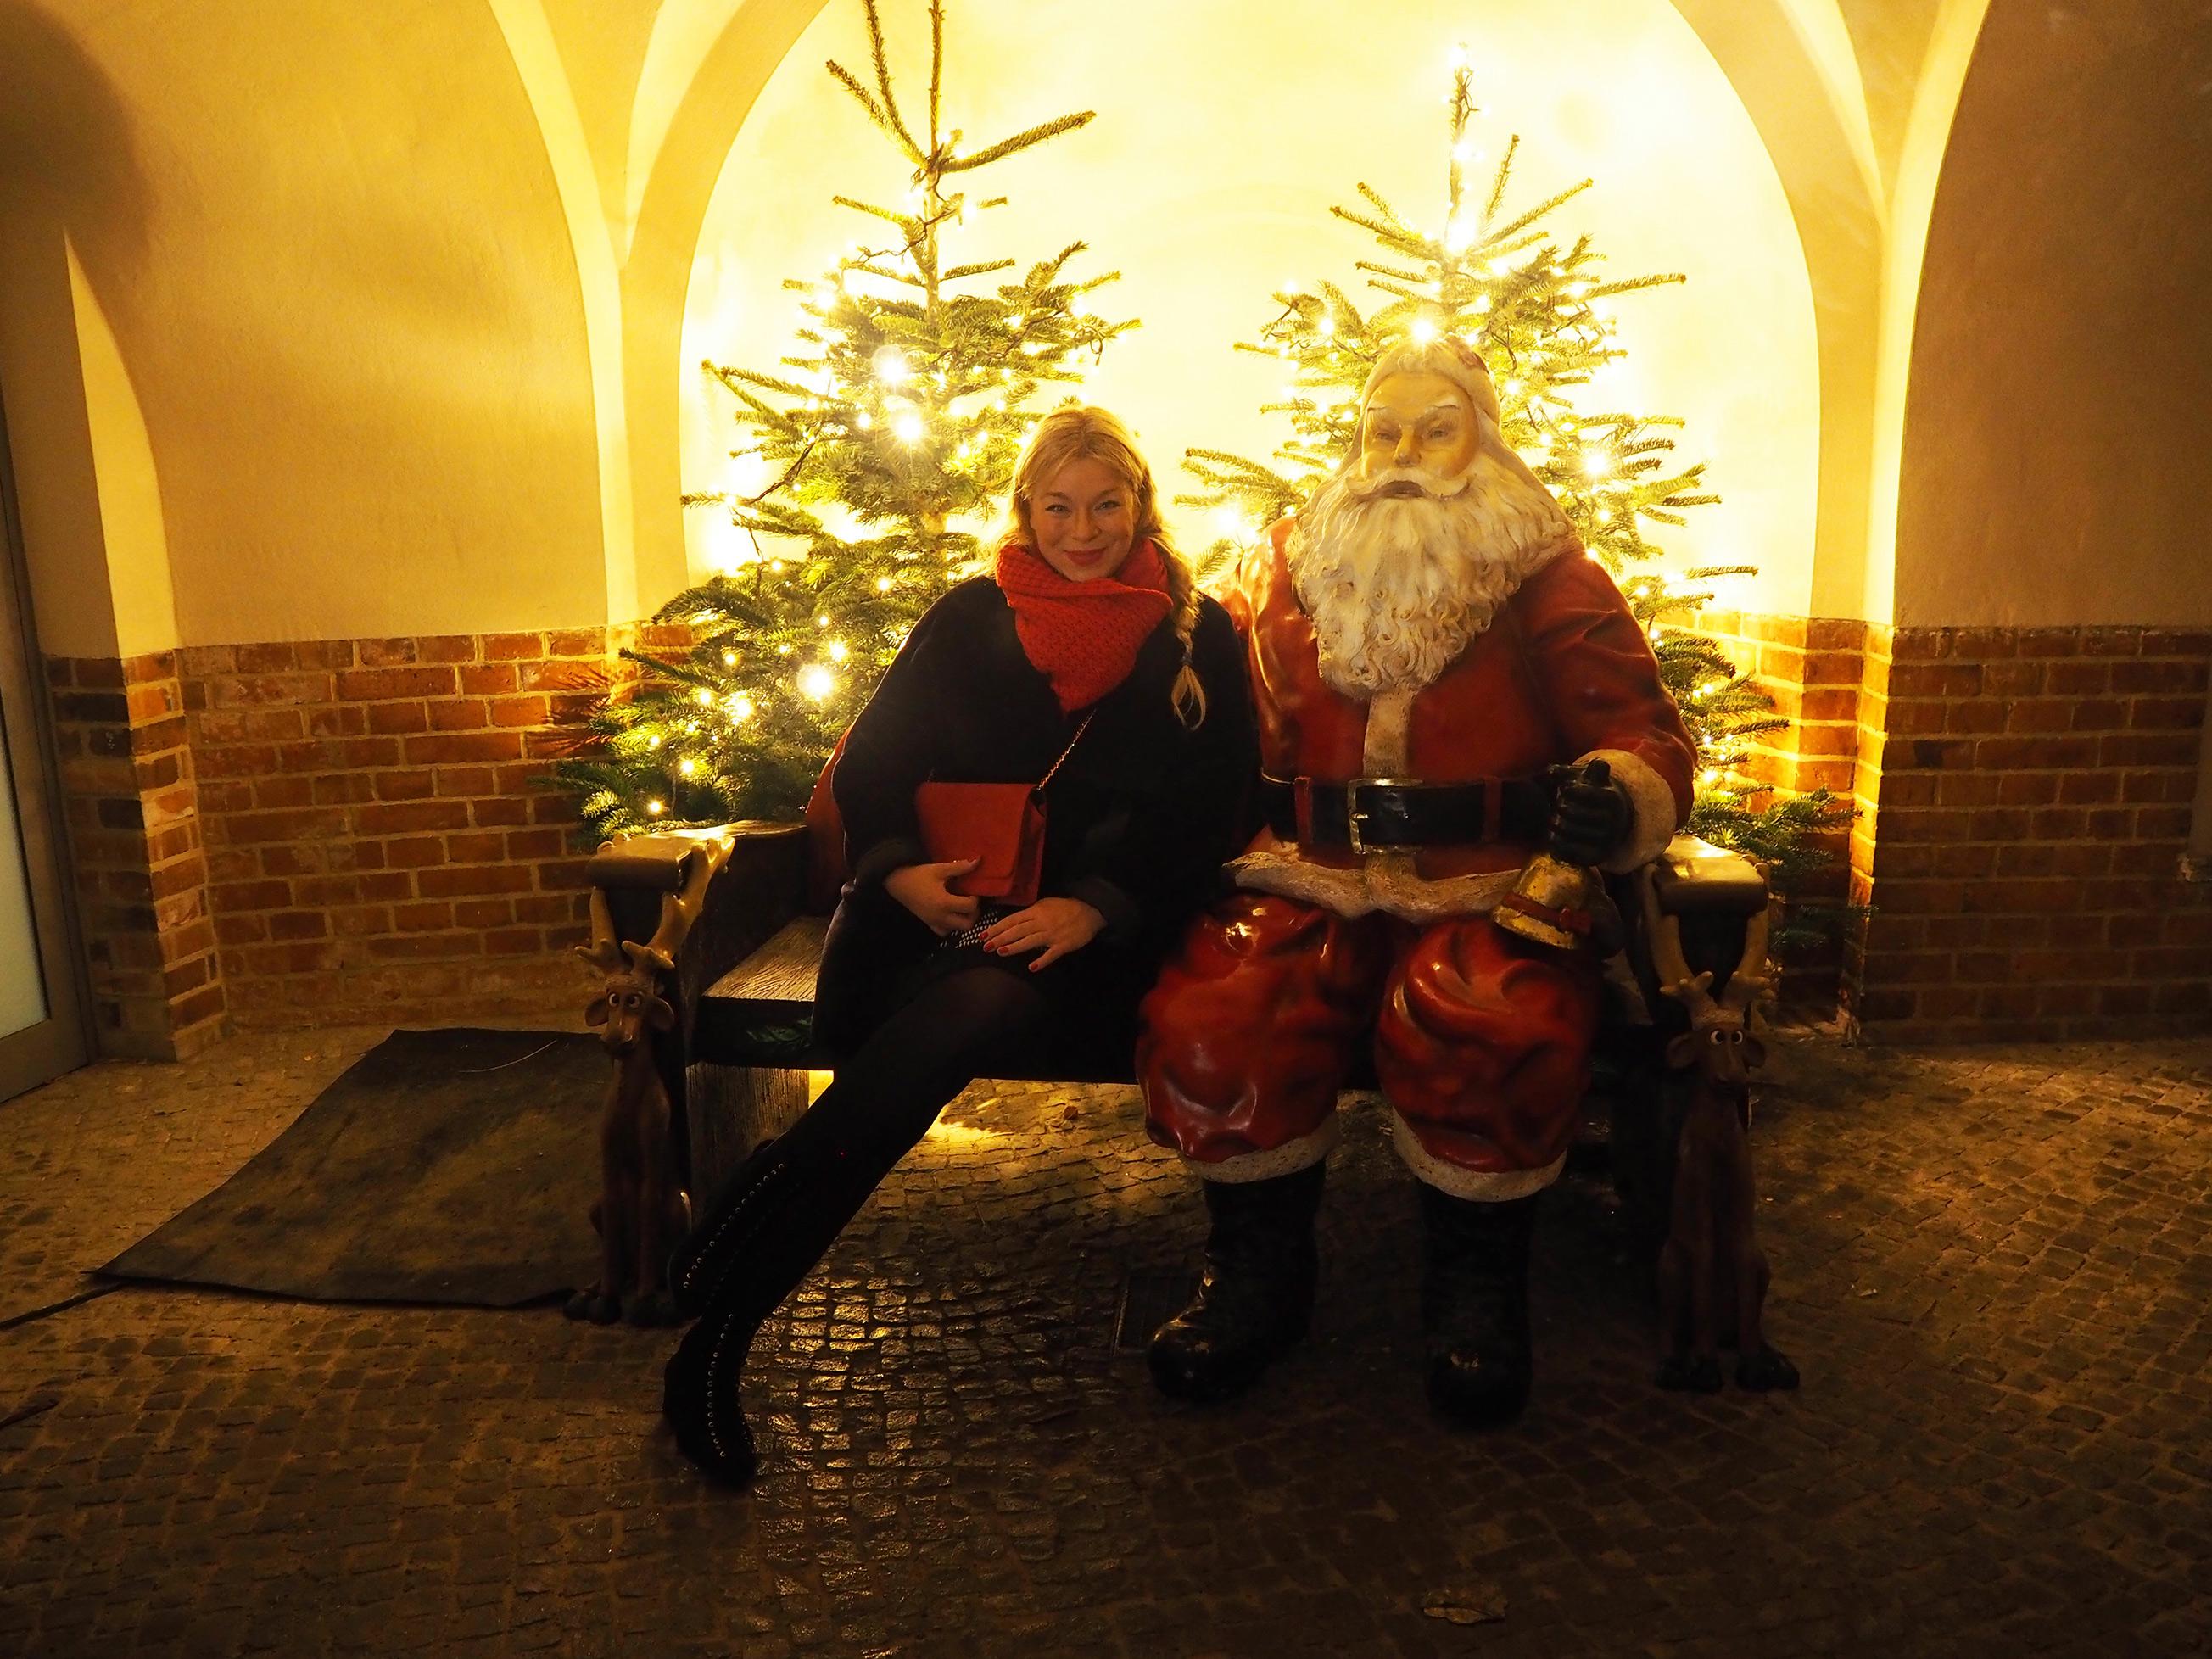 christmasgarden-megabambi-caterina-pogorzelski-plussizeblogger-Berlin-Blog